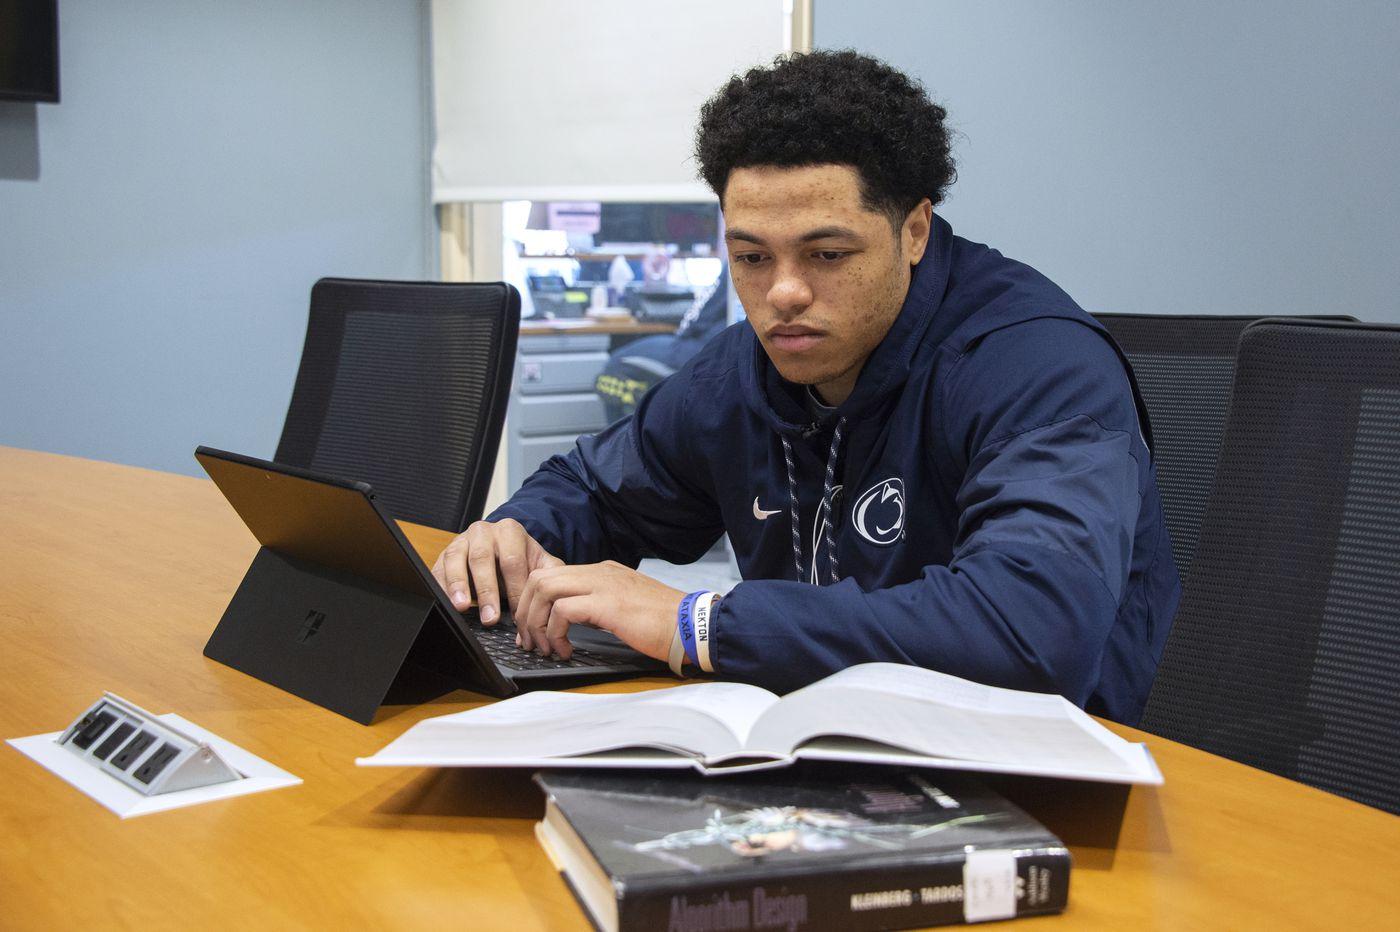 Penn State cornerback John Reid puts a lot of time into his studies, but don't call it a sacrifice